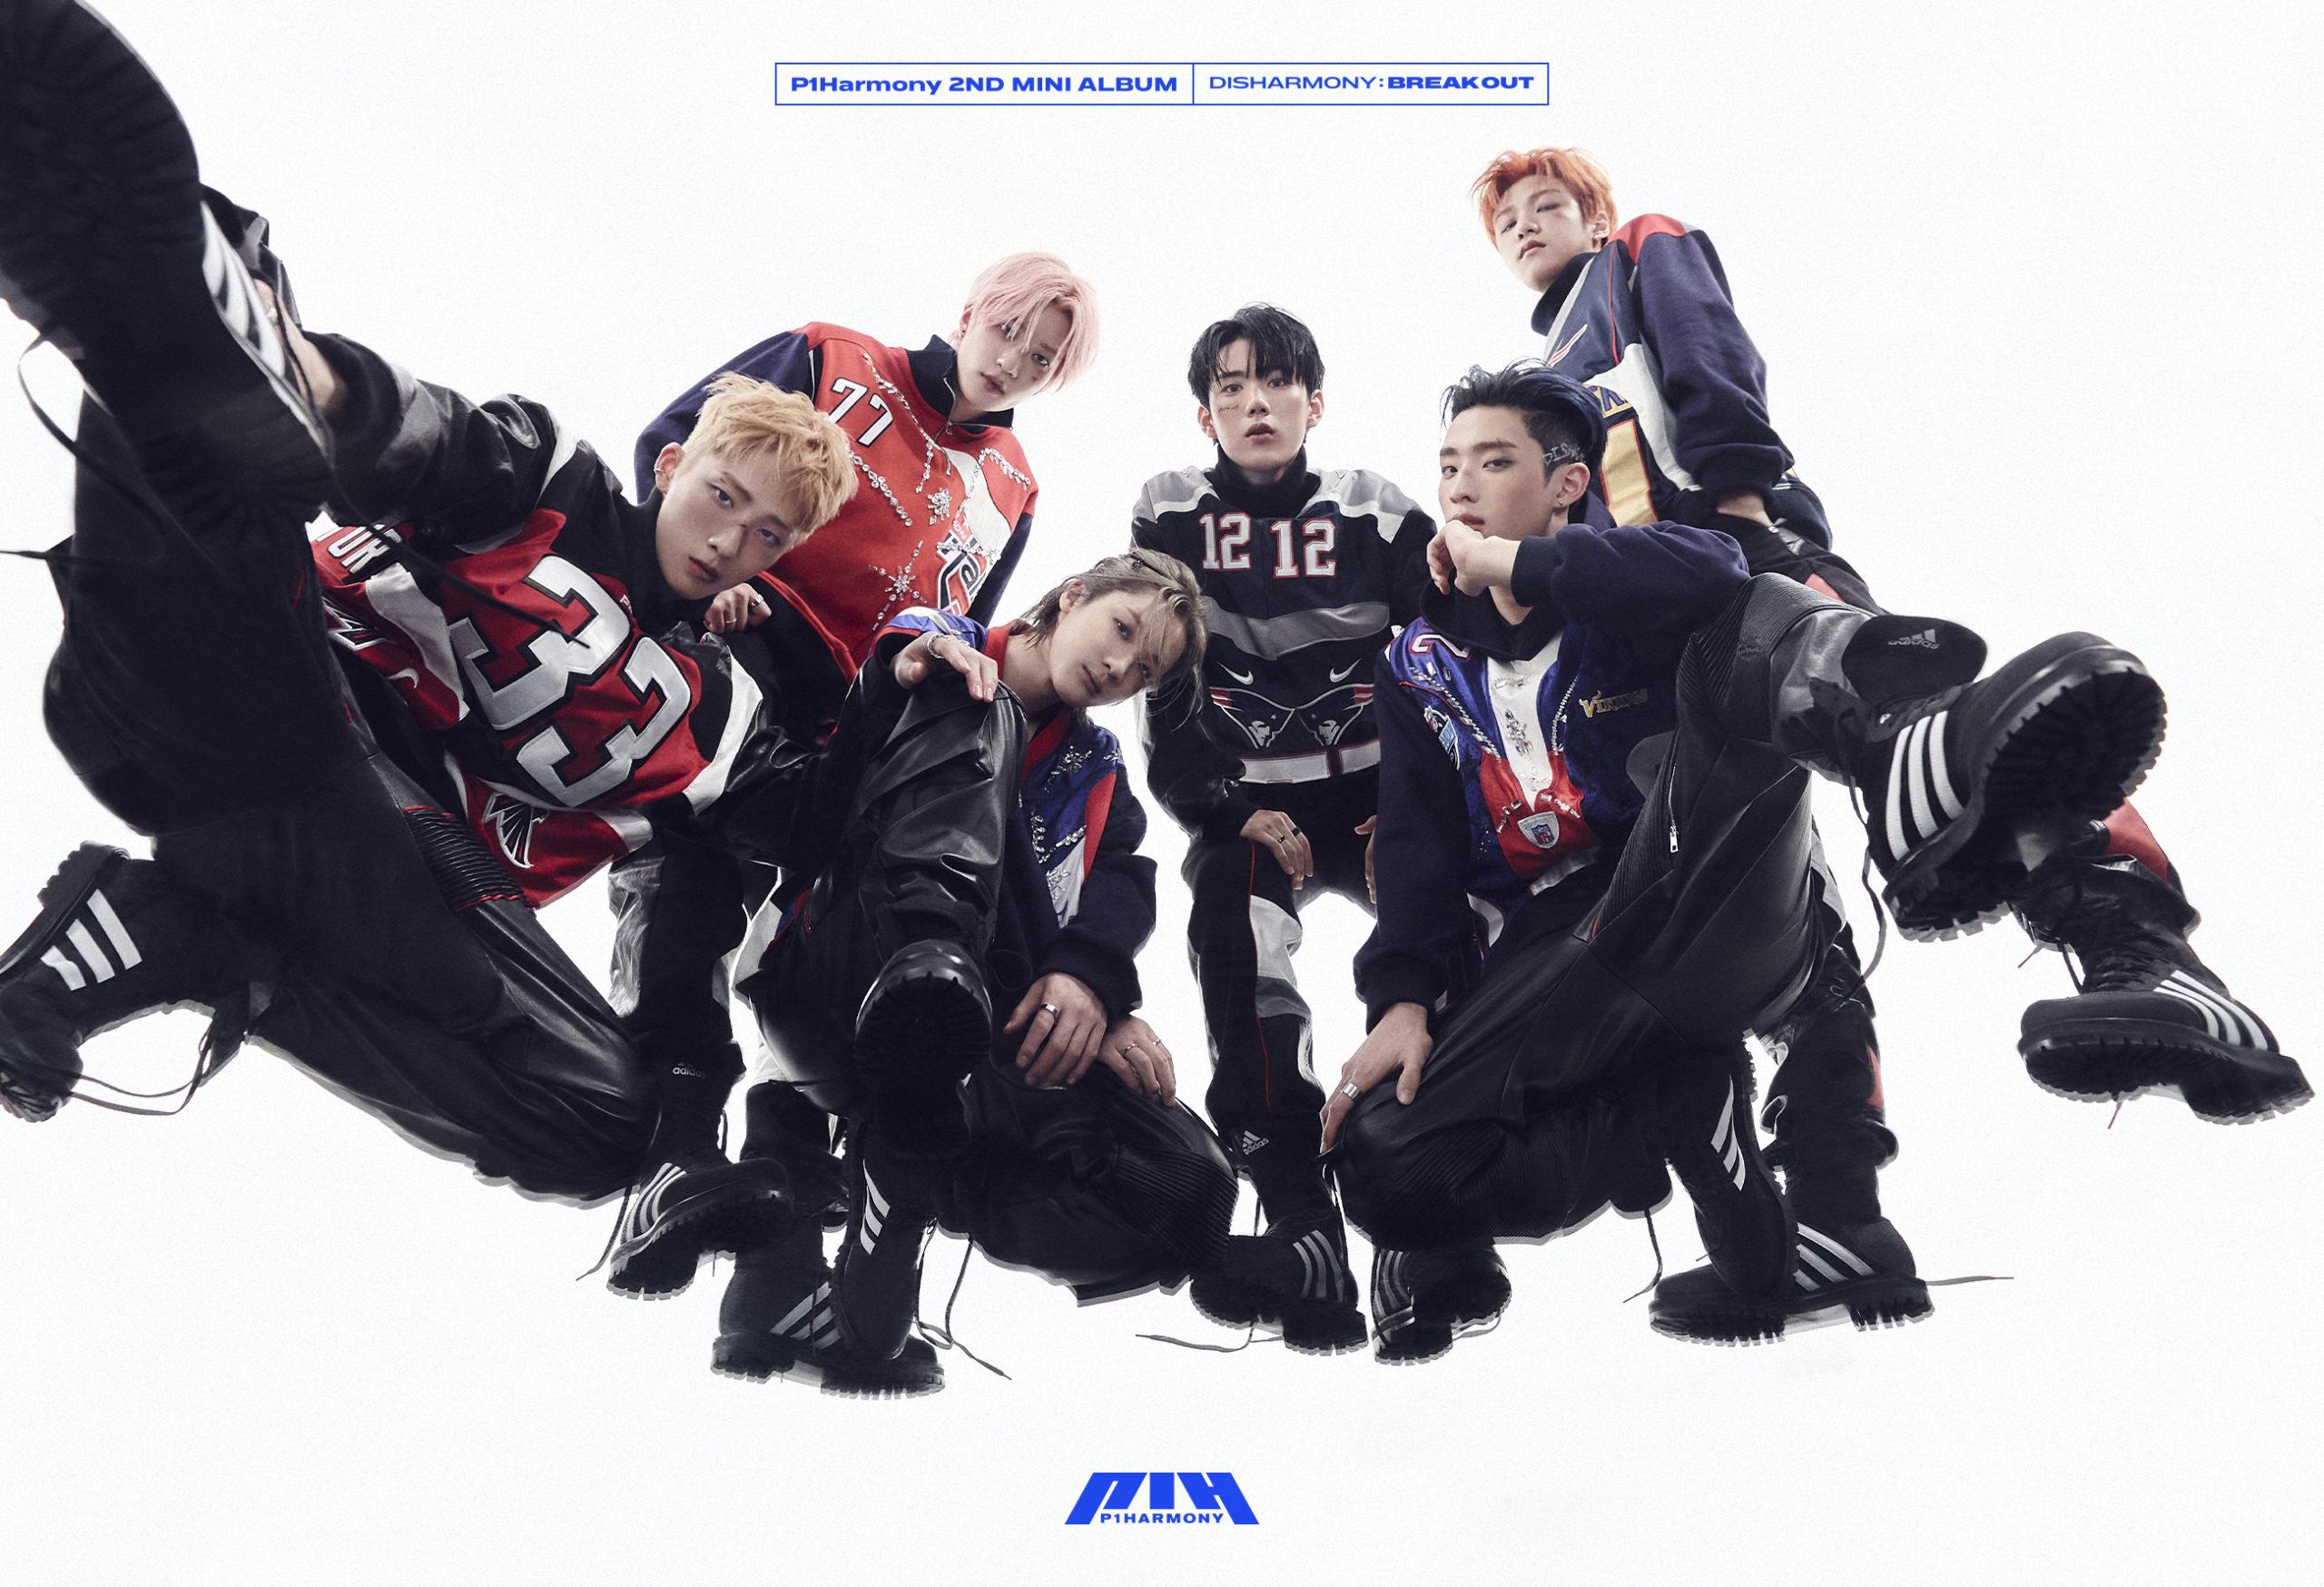 P1Harmony 2nd Mini Album [DISHARMONY : BREAK OUT] テレビ電話のサイン会